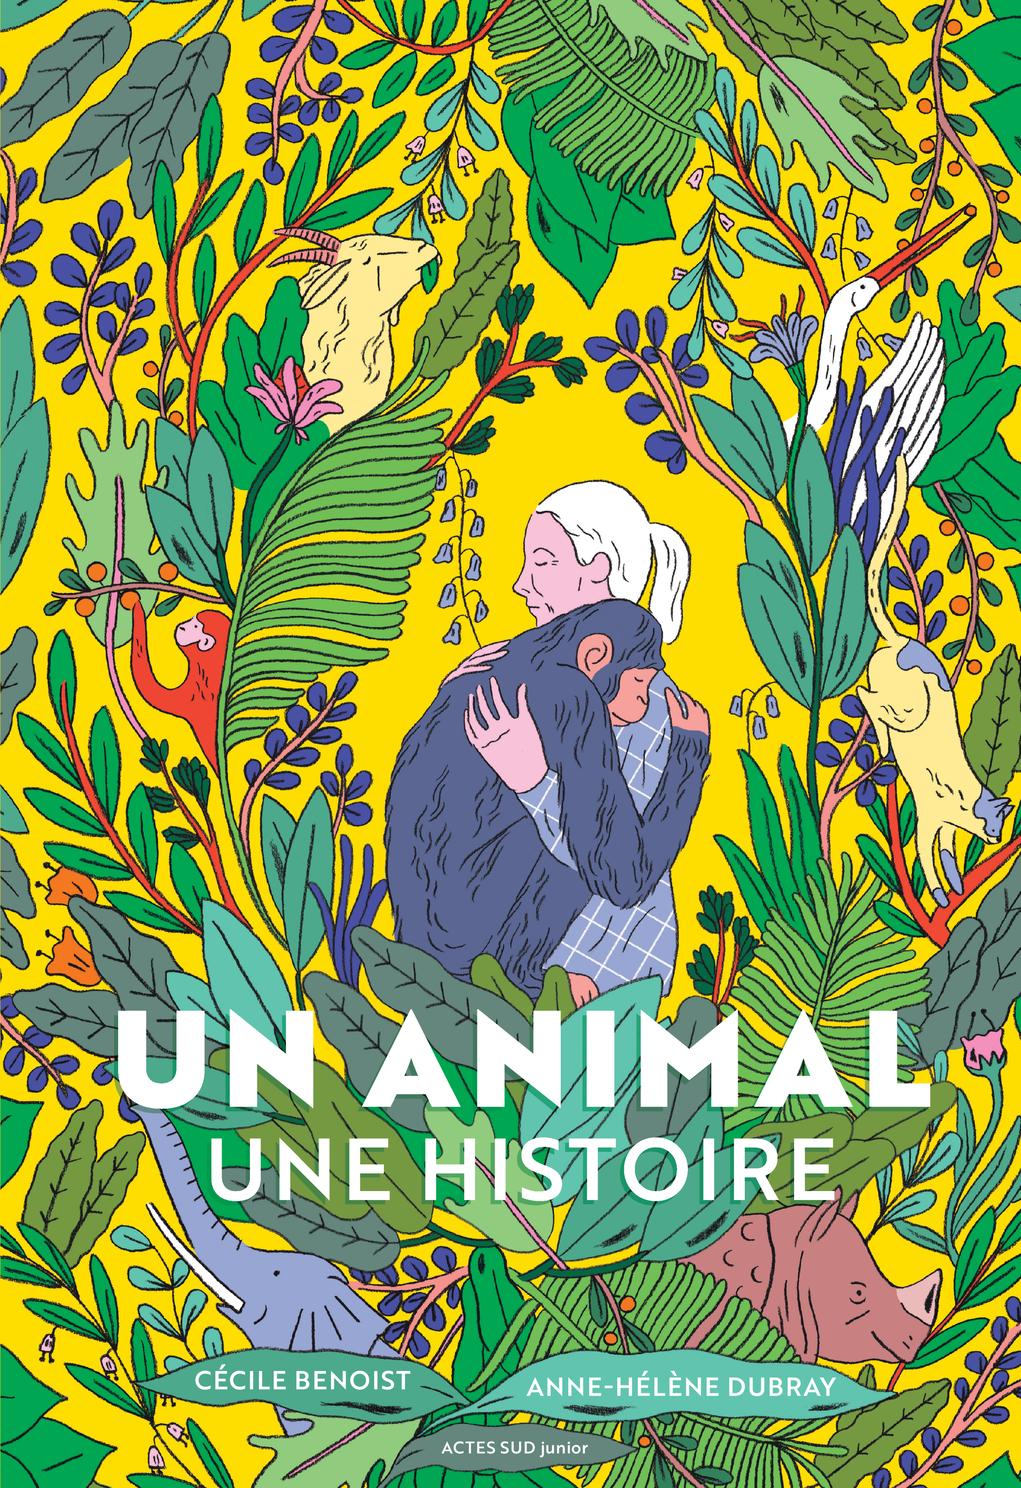 UN ANIMAL, UNE HISTOIRE